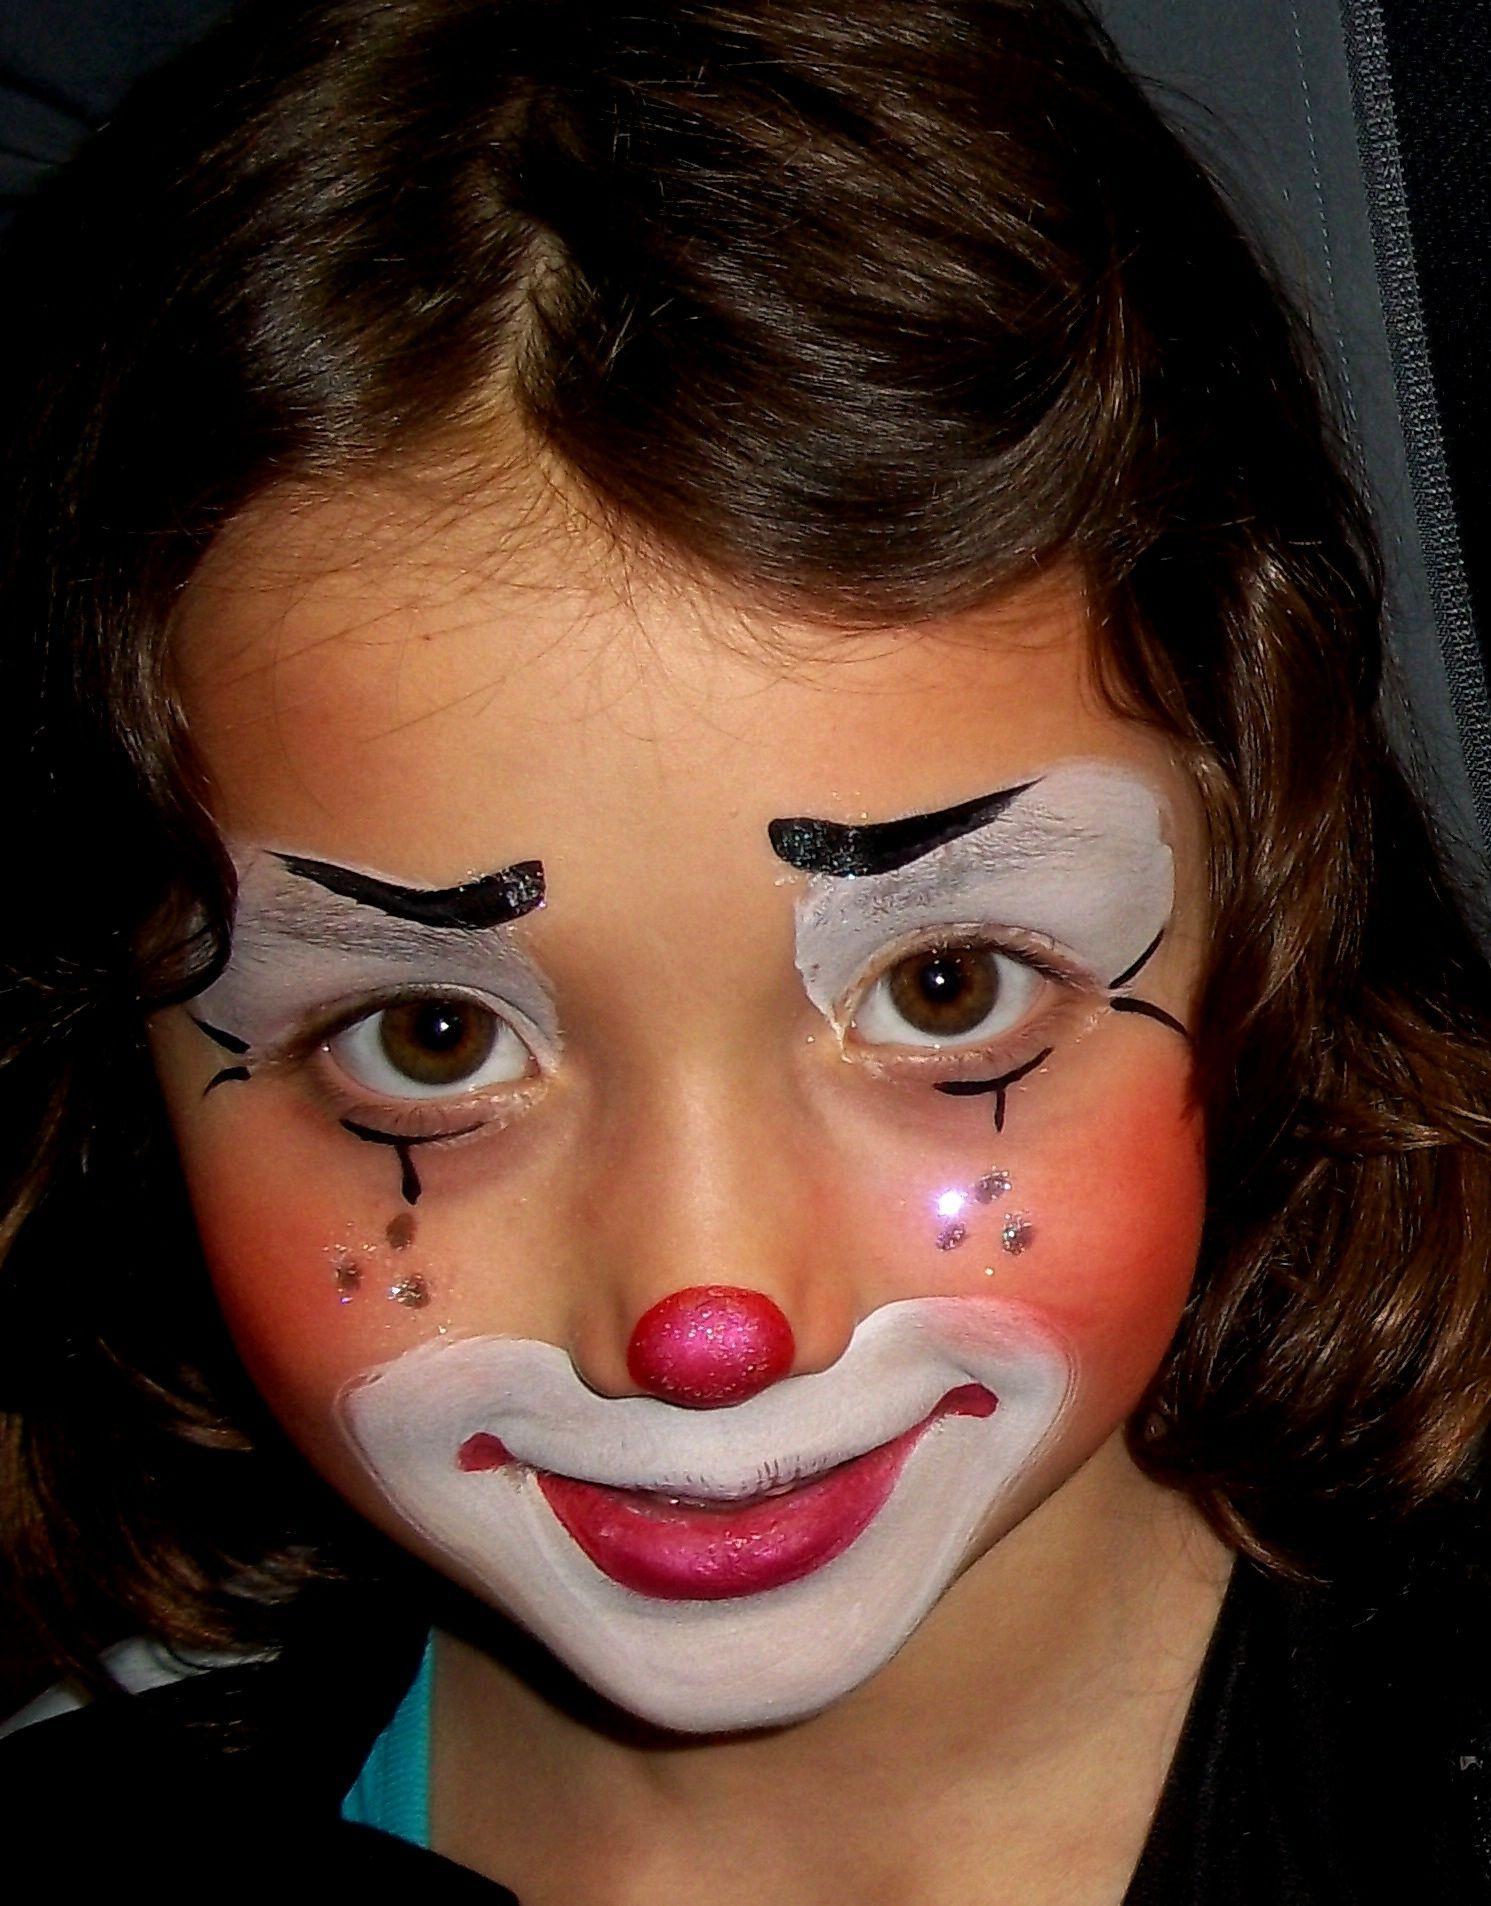 Clown Schminken Karneval Clown In Koln Deutschland Stockfoto Bild